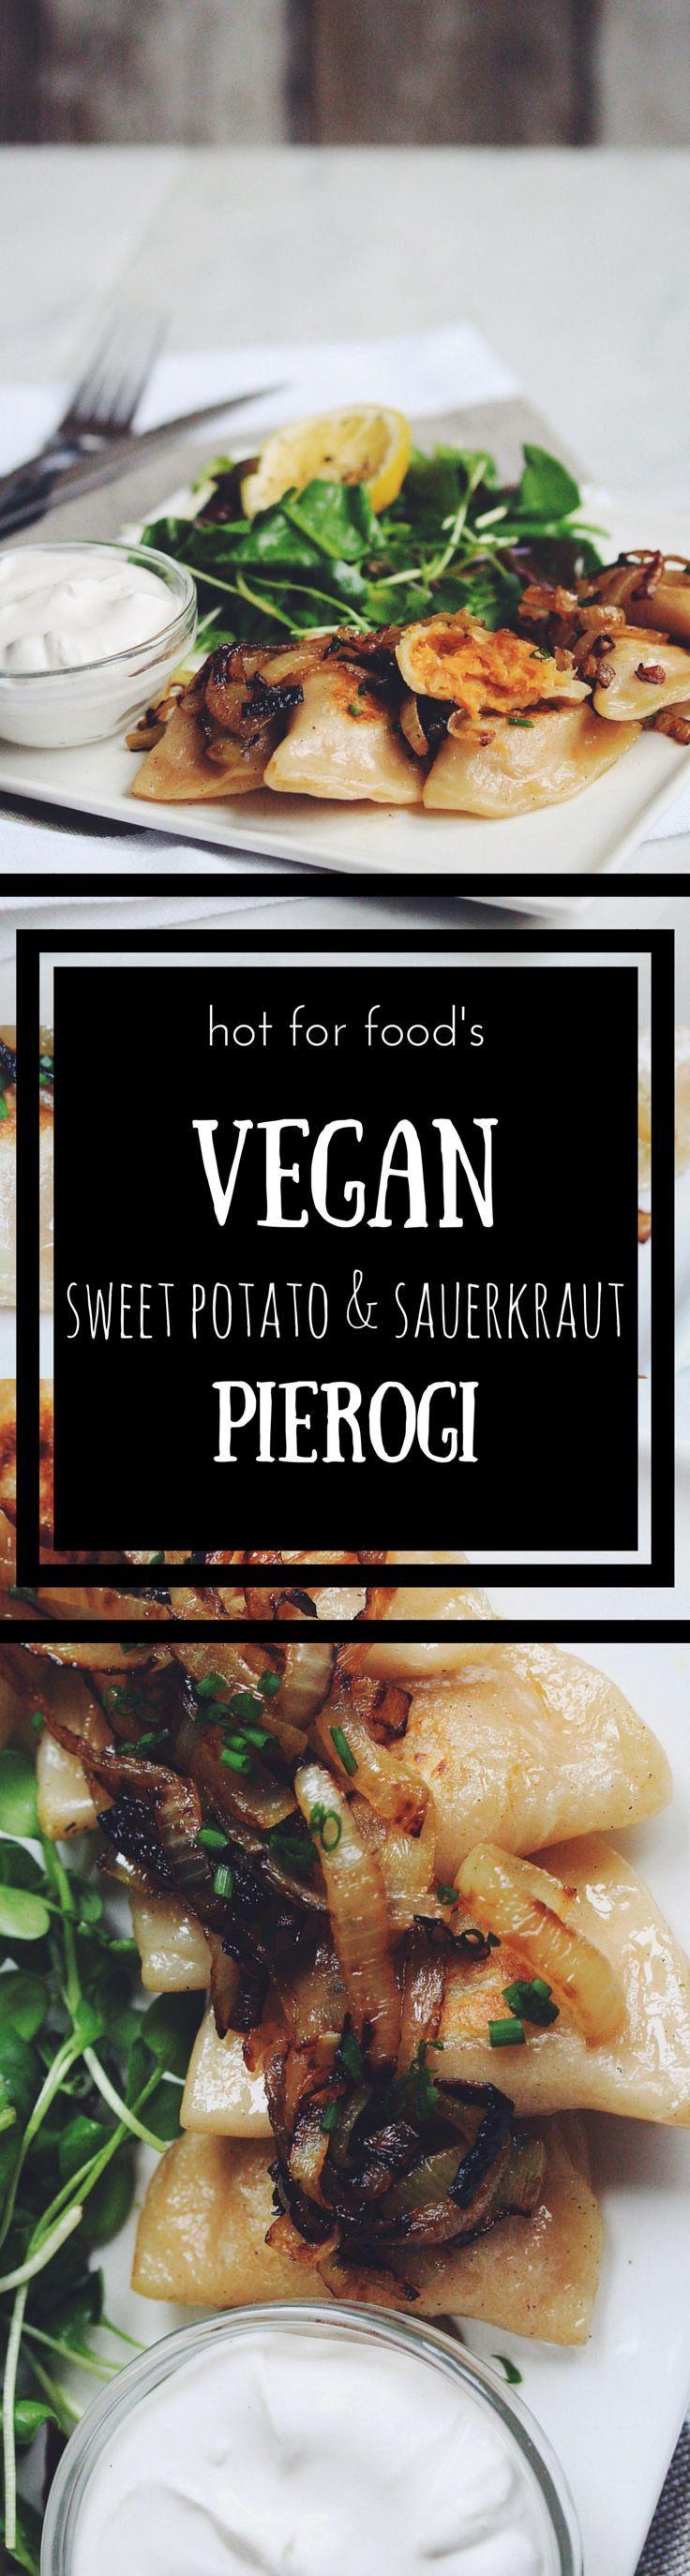 vegan sweet potato and sauerkraut pierogi | RECIPE on http://hotforfoodblog.com